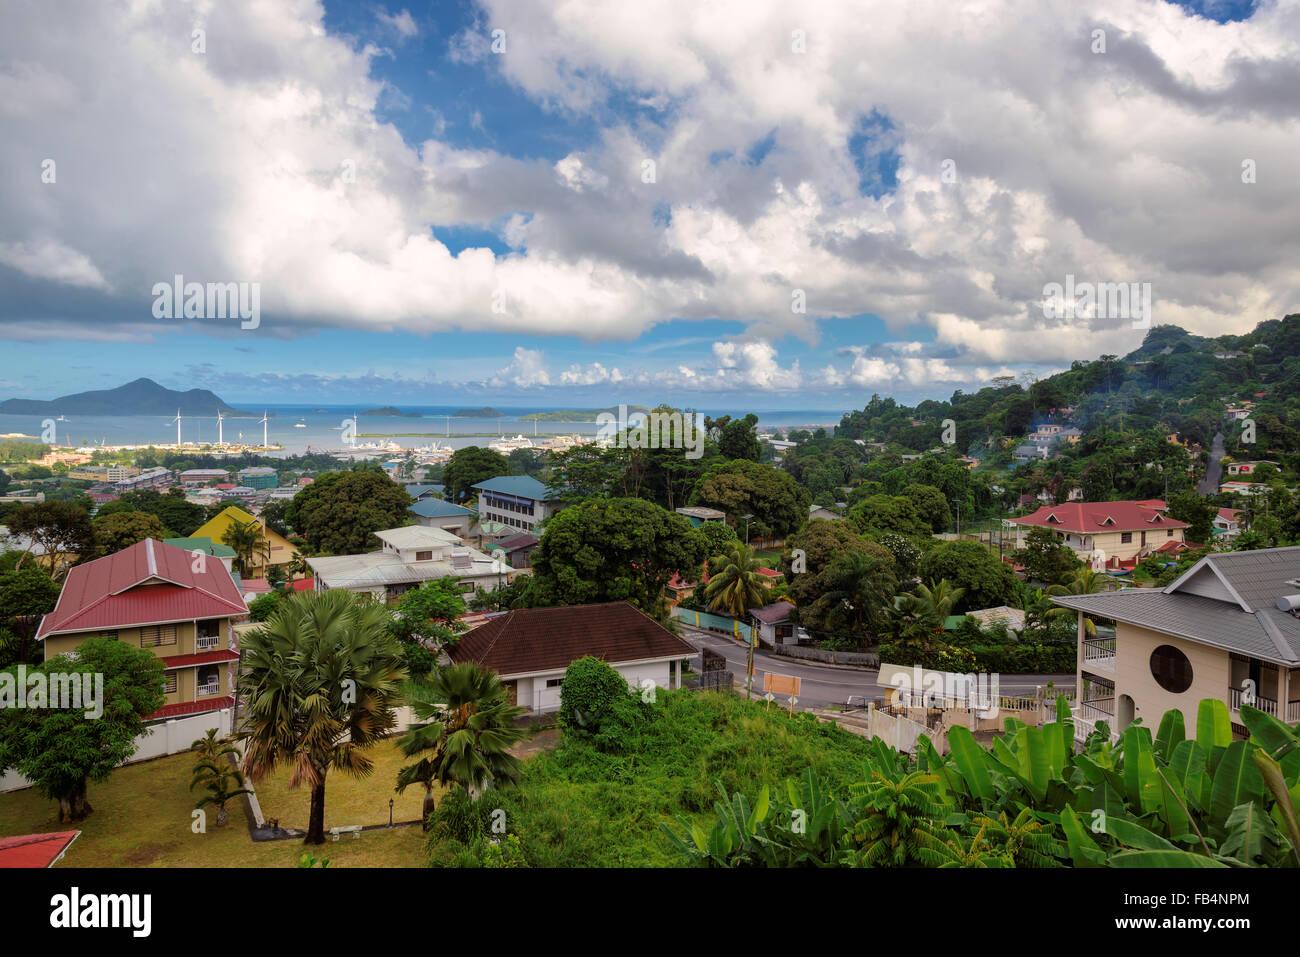 Aerial view of Mahe coastline, Victoria, Seychelles - Stock Image